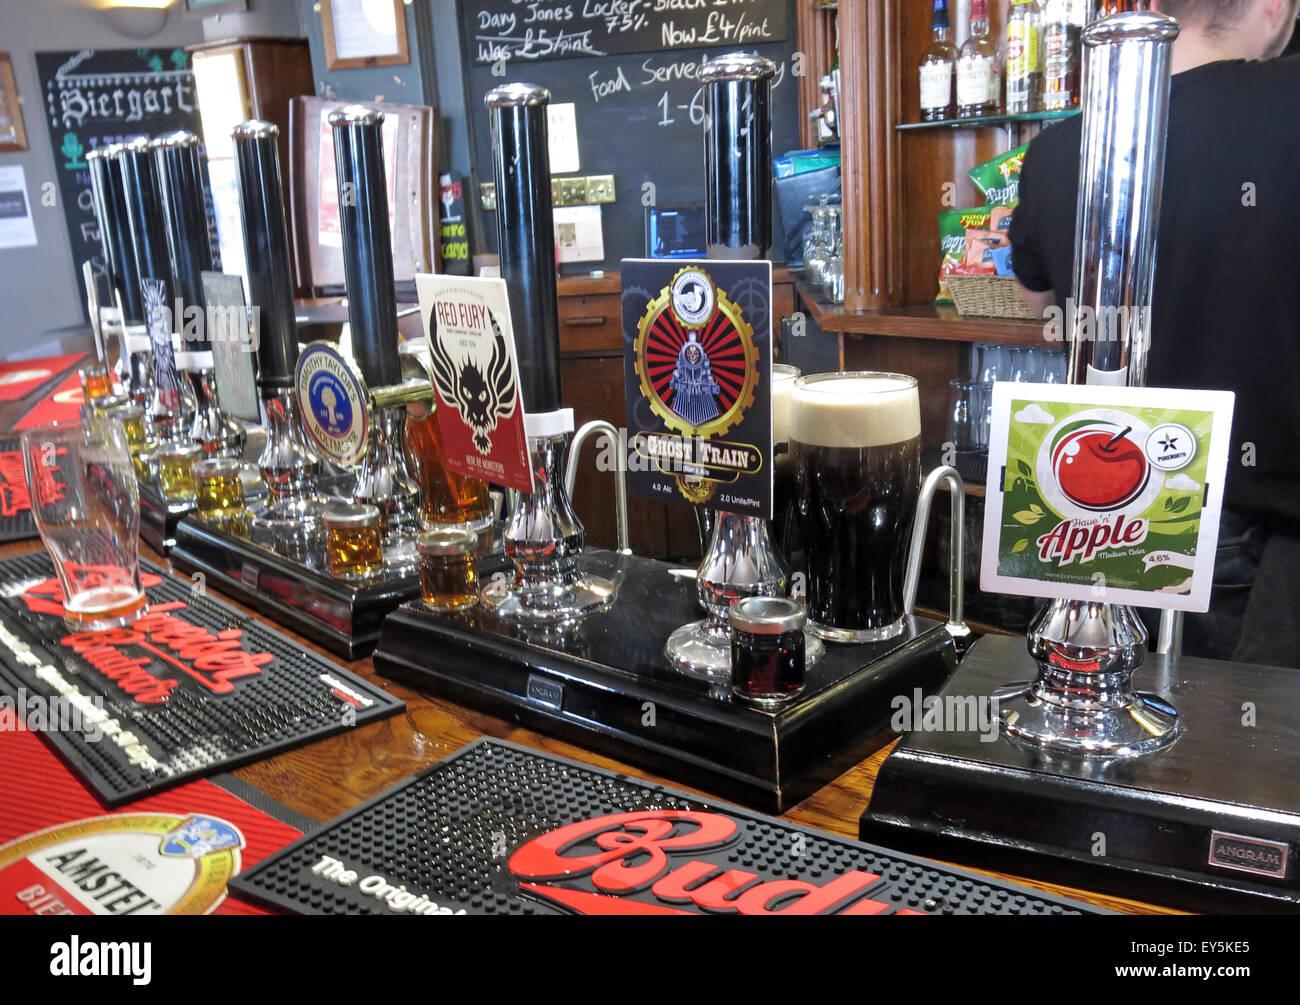 The Sportsman Inn, Huddersfield, West Yorkshire, England, UK Stock Photo